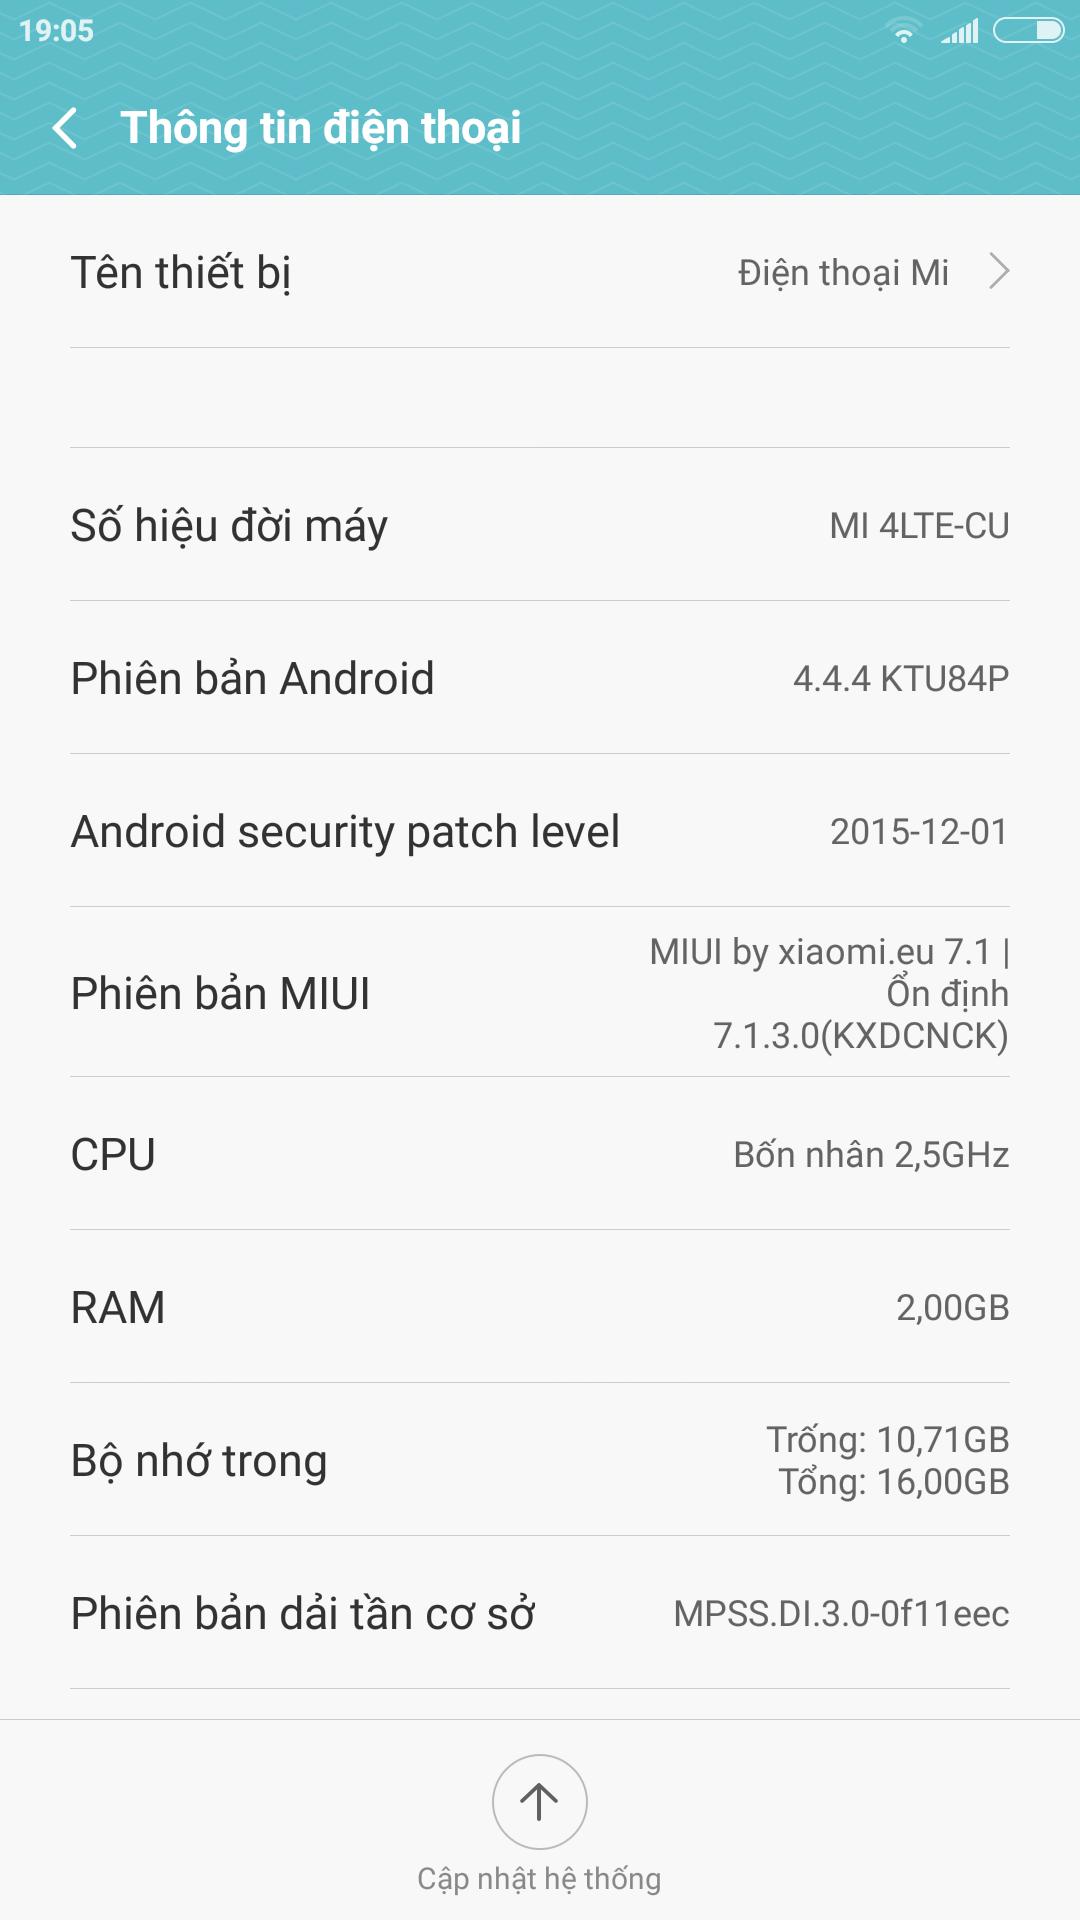 Screenshot_2016-03-18-19-05-39_com.android.settings.png